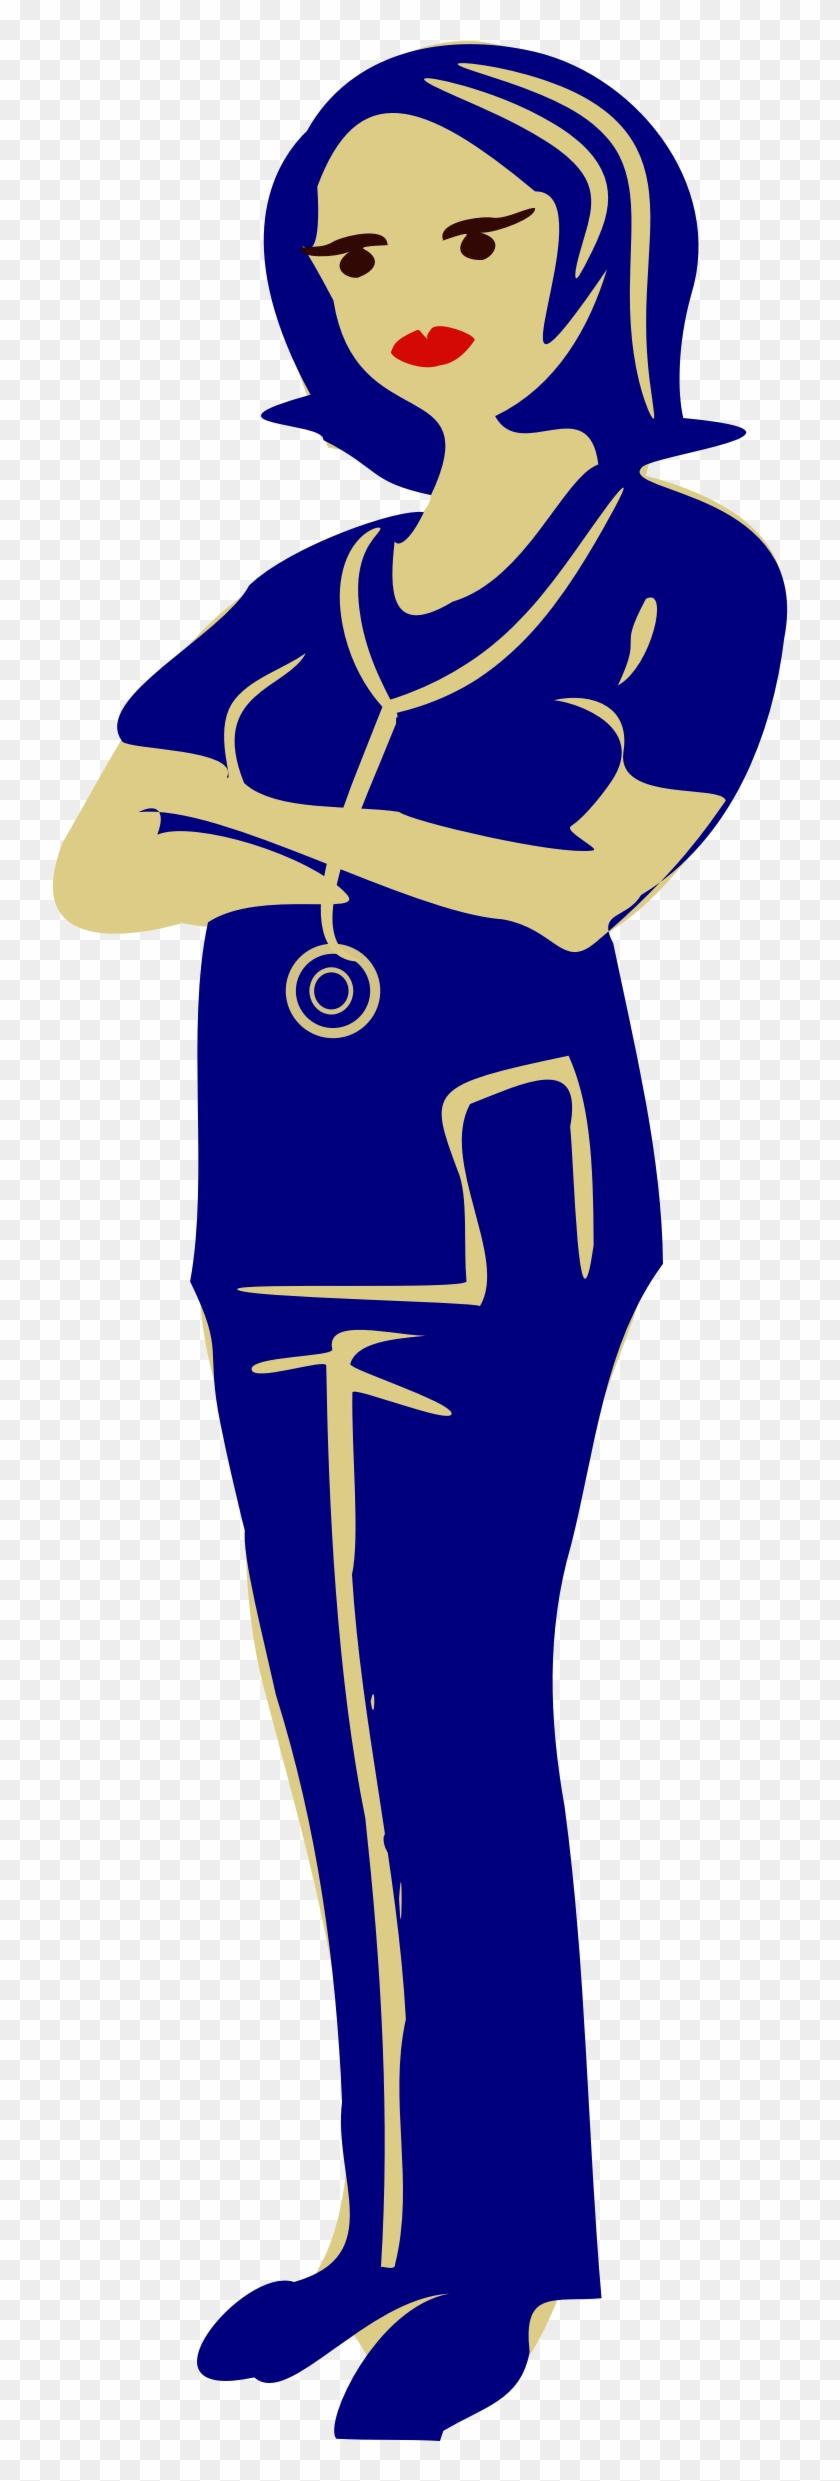 Clinical Nurse - Nurses Clip Art #103446